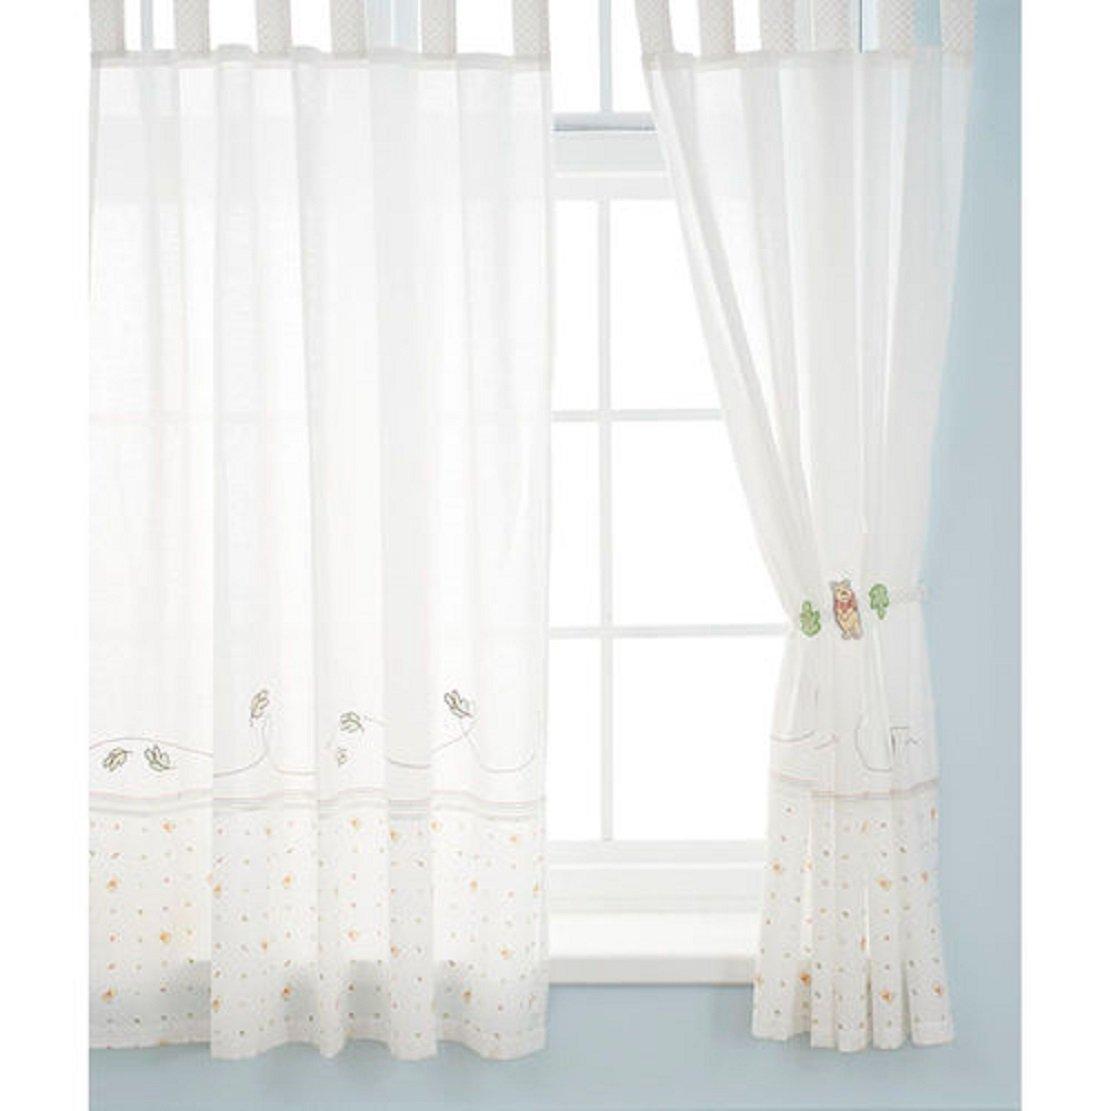 fd3011242fdb Winnie the Pooh Curtains and Tiebacks  Amazon.co.uk  Baby